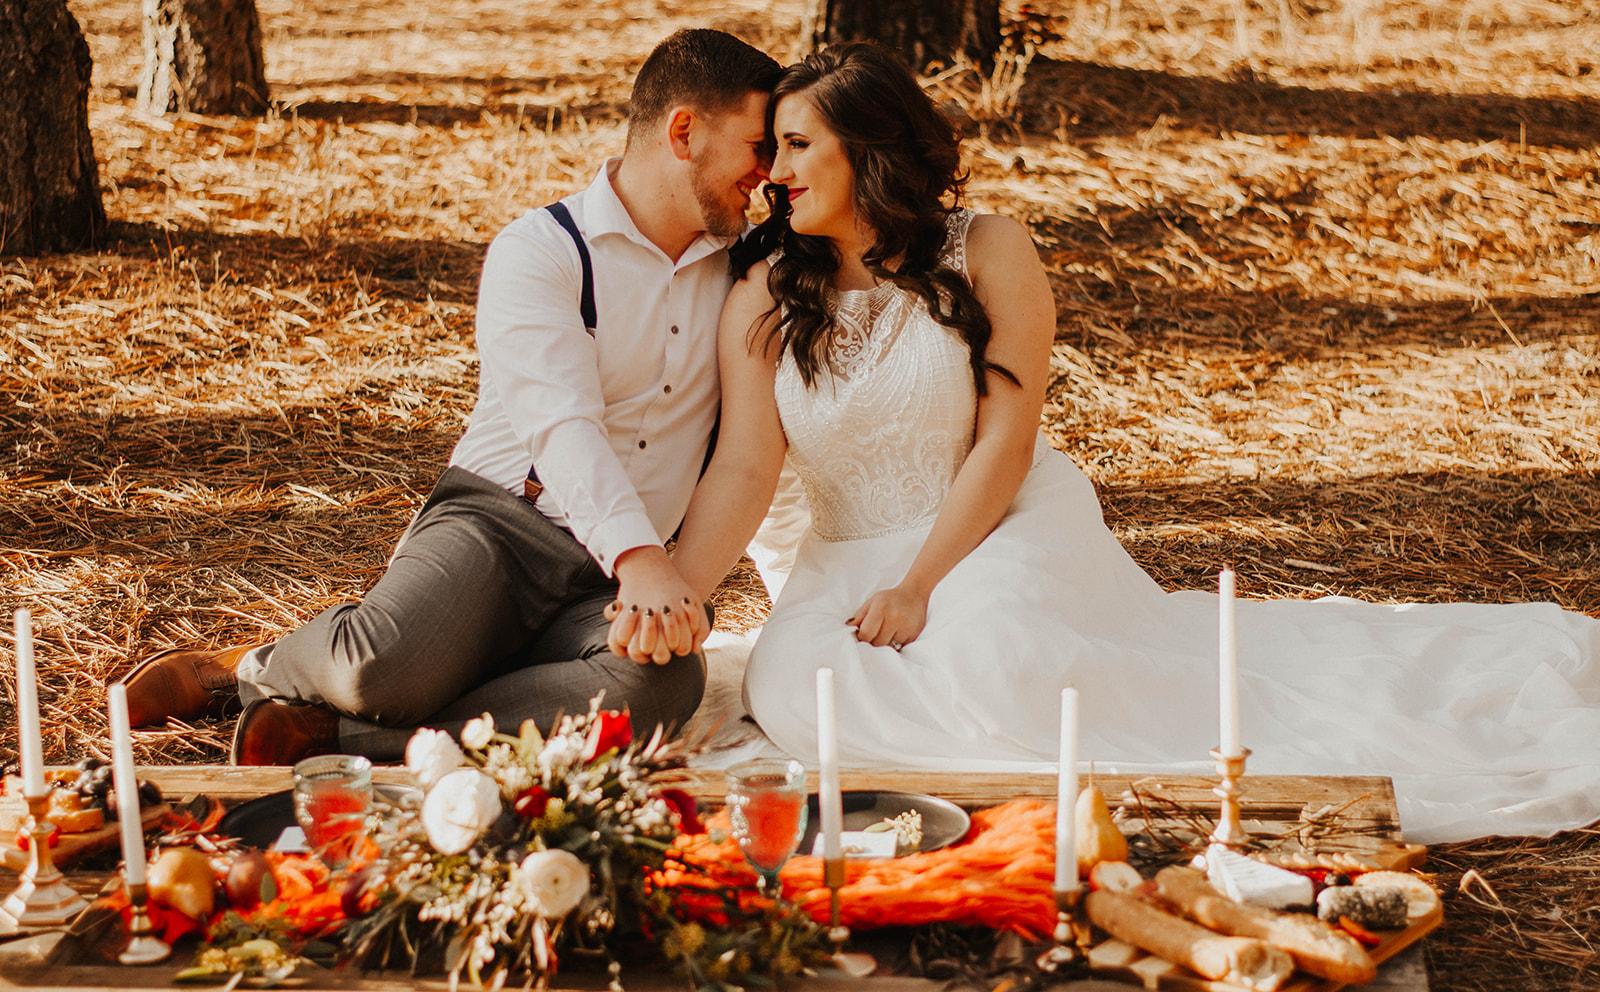 couple at wedding elopement dinner spokane